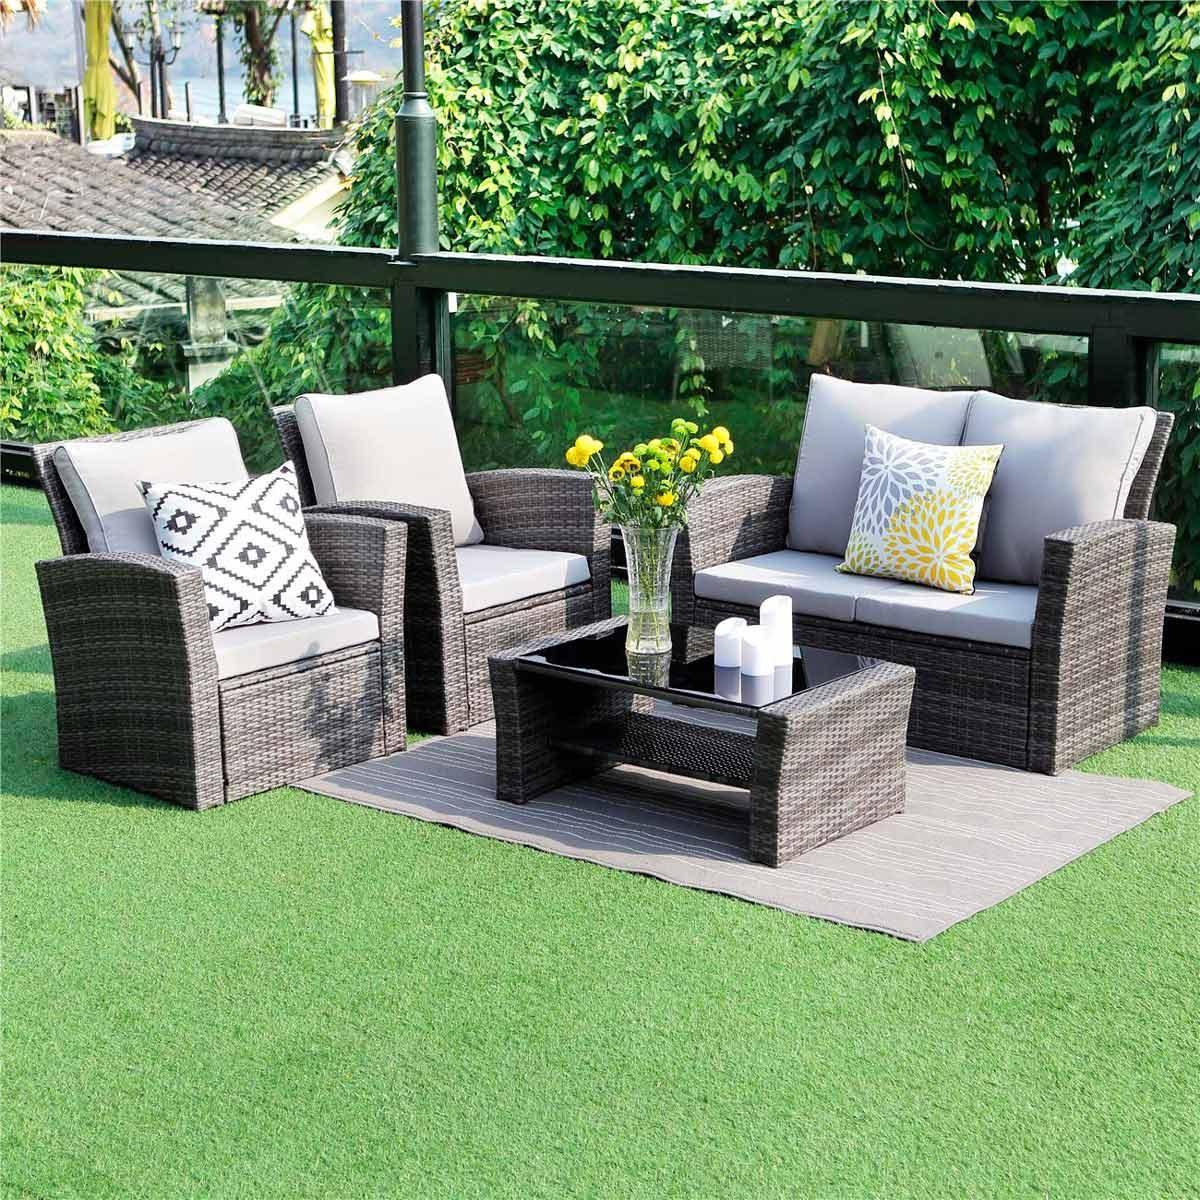 amazon patio furniture we re buying